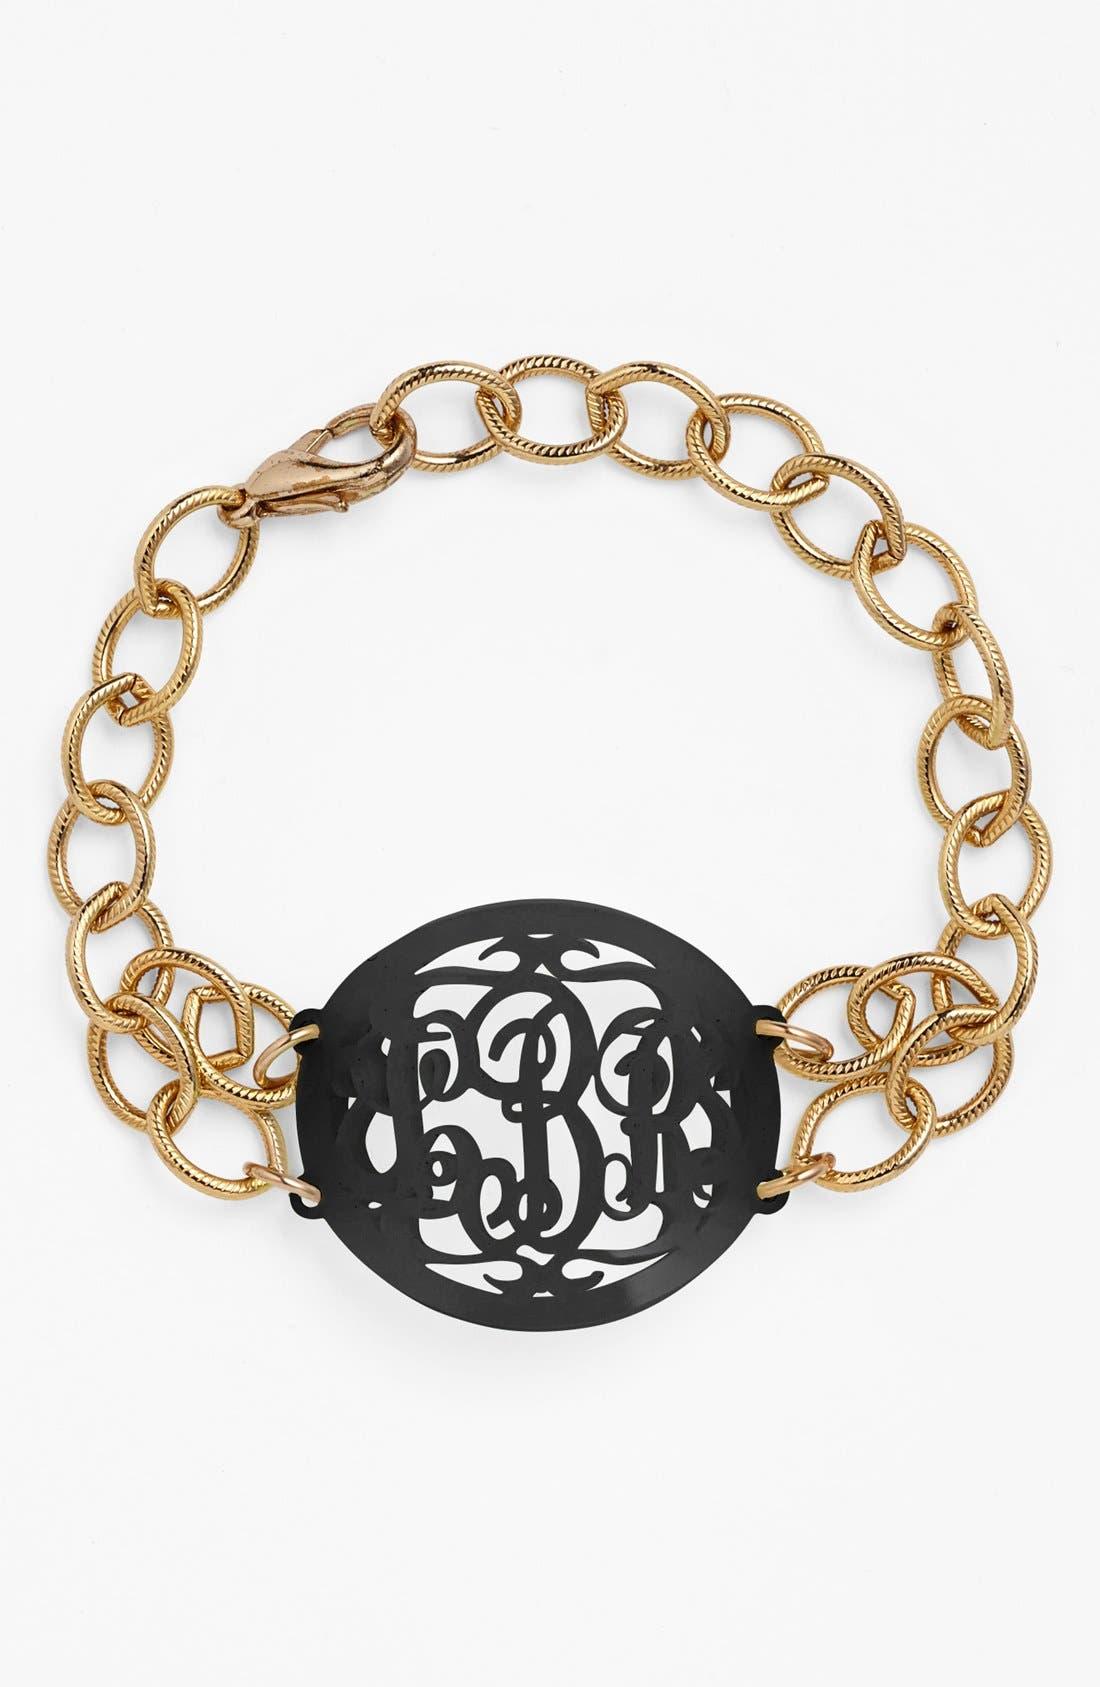 MOON AND LOLA 'Annabel' Medium Oval Personalized Monogram Bracelet, Main, color, EBONY/ GOLD